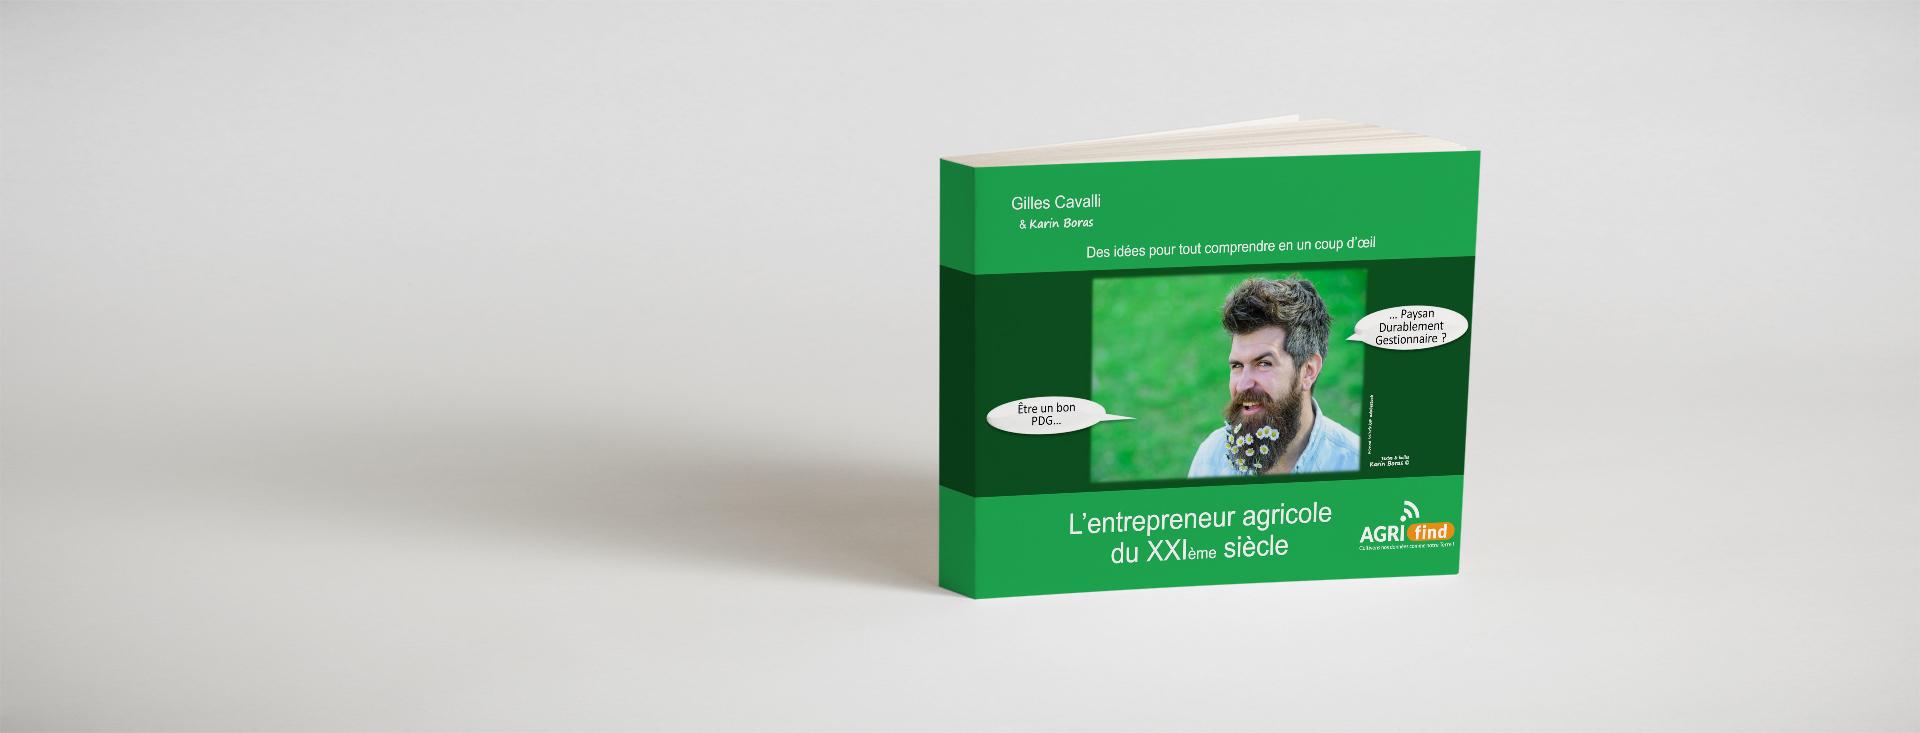 entrepreneur_agricole_XXIeme_siecle